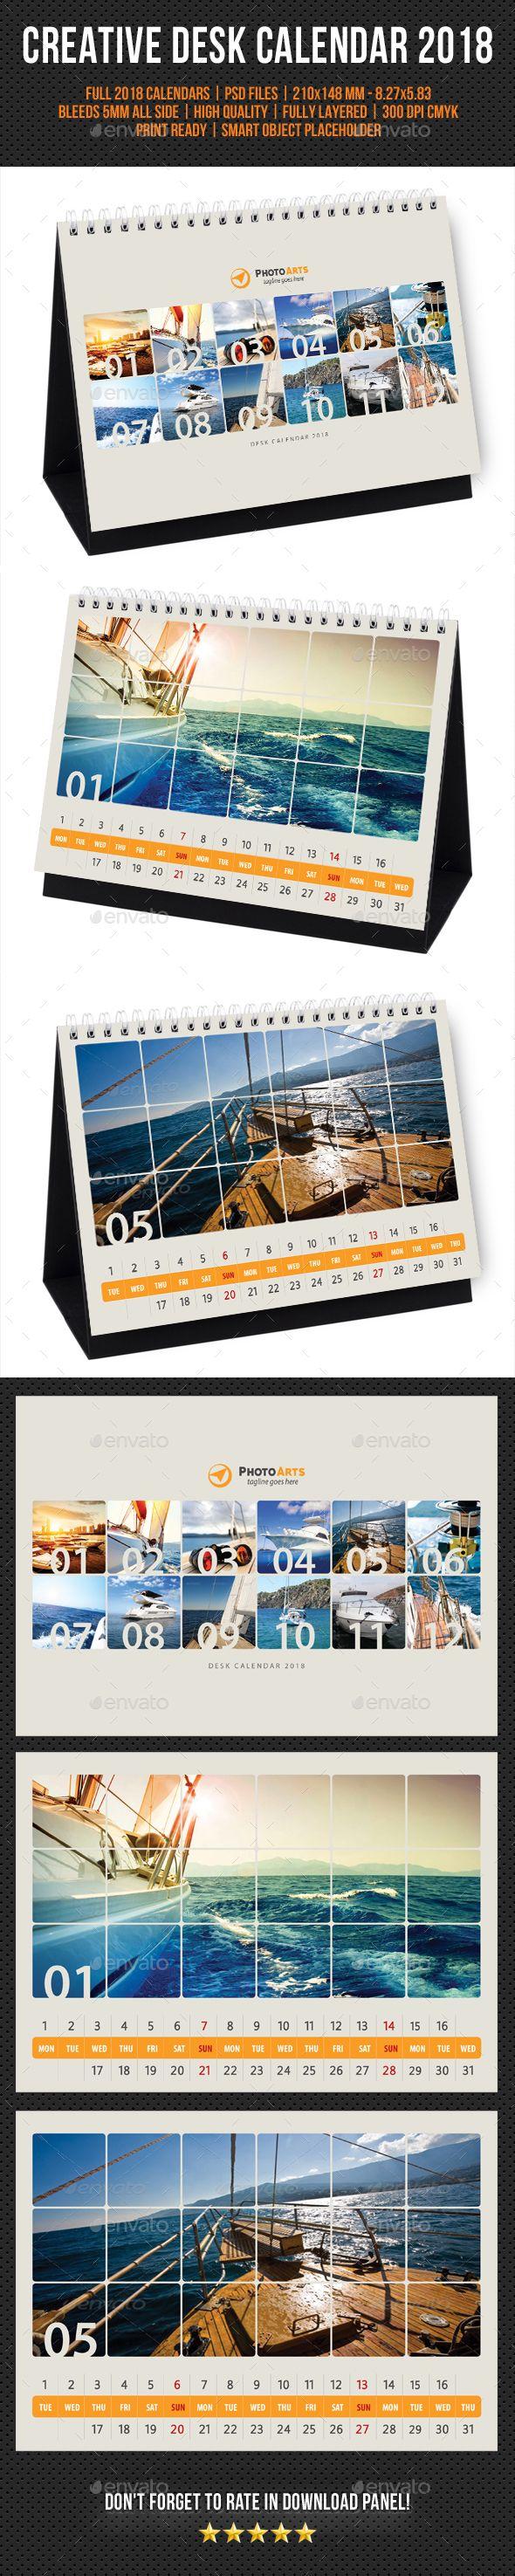 #Creative #Desk #Calendar #template #2018 V28 - #corporate #company Calendars Stationery #design. download; https://graphicriver.net/item/creative-desk-calendar-2018-v28/20311151?ref=yinkira